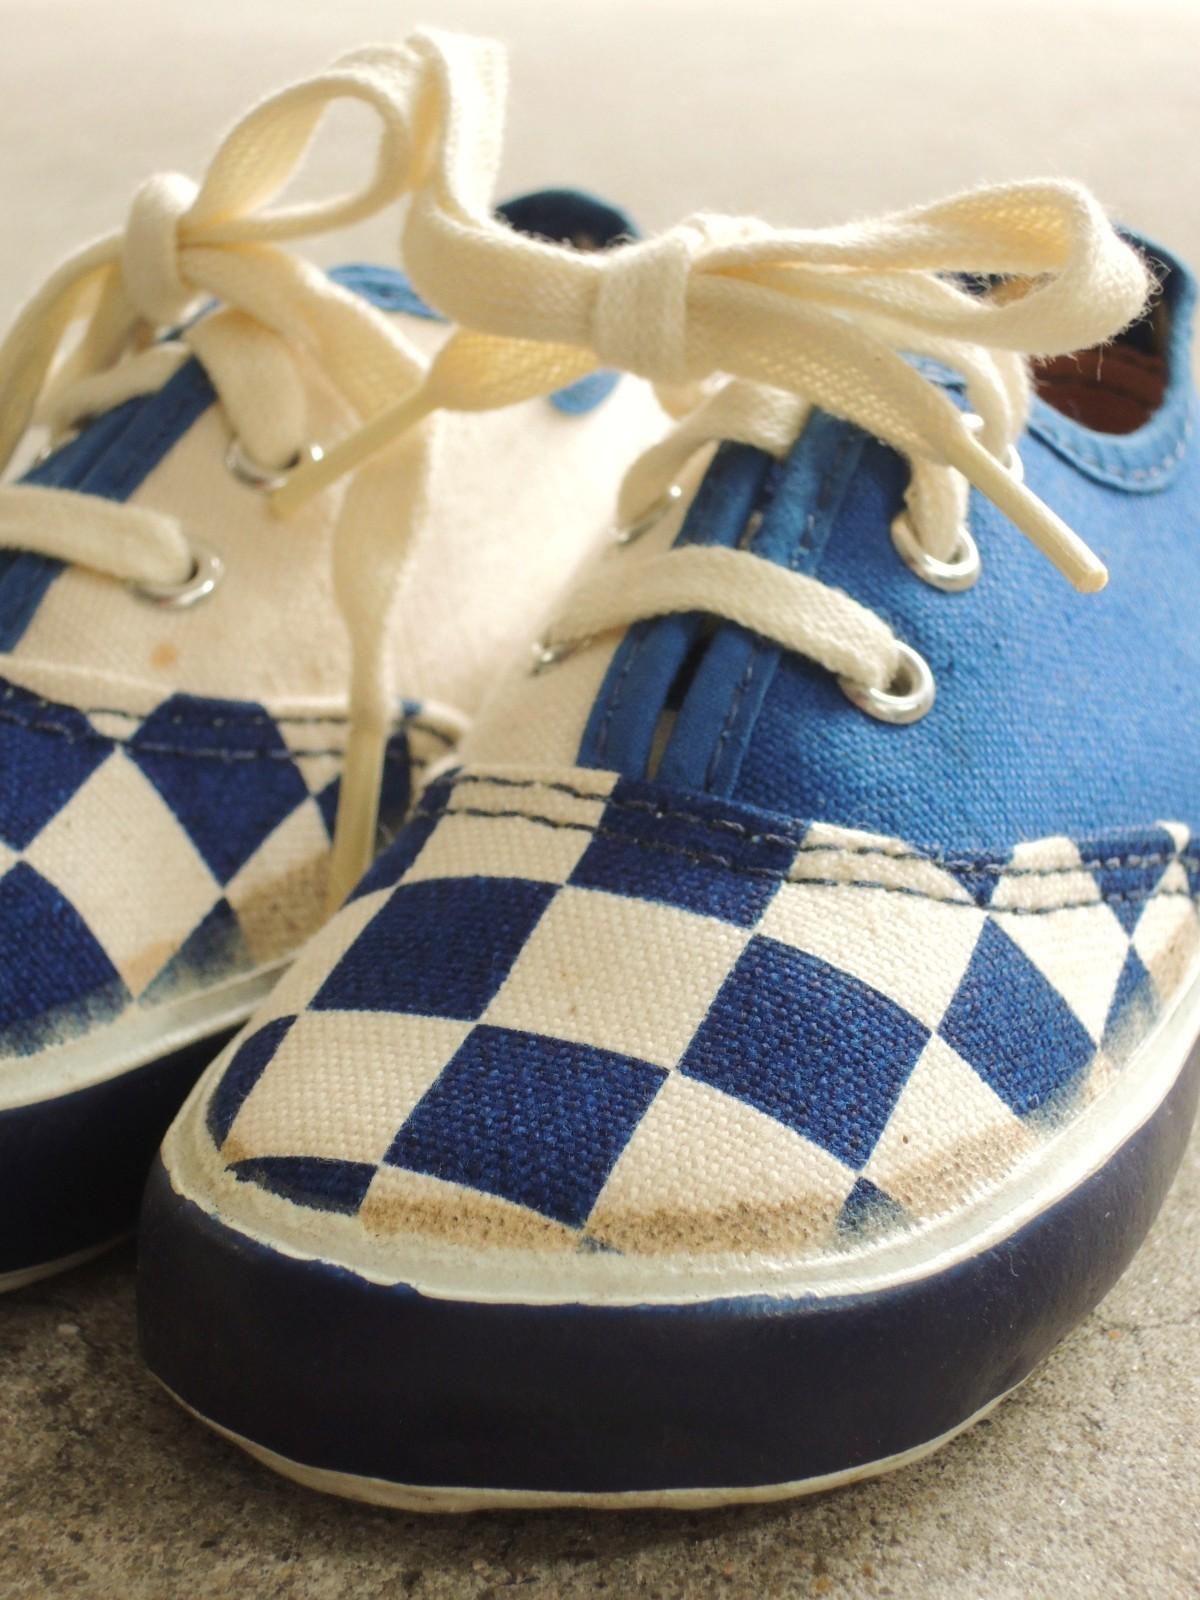 kedssupersneaker04.JPG